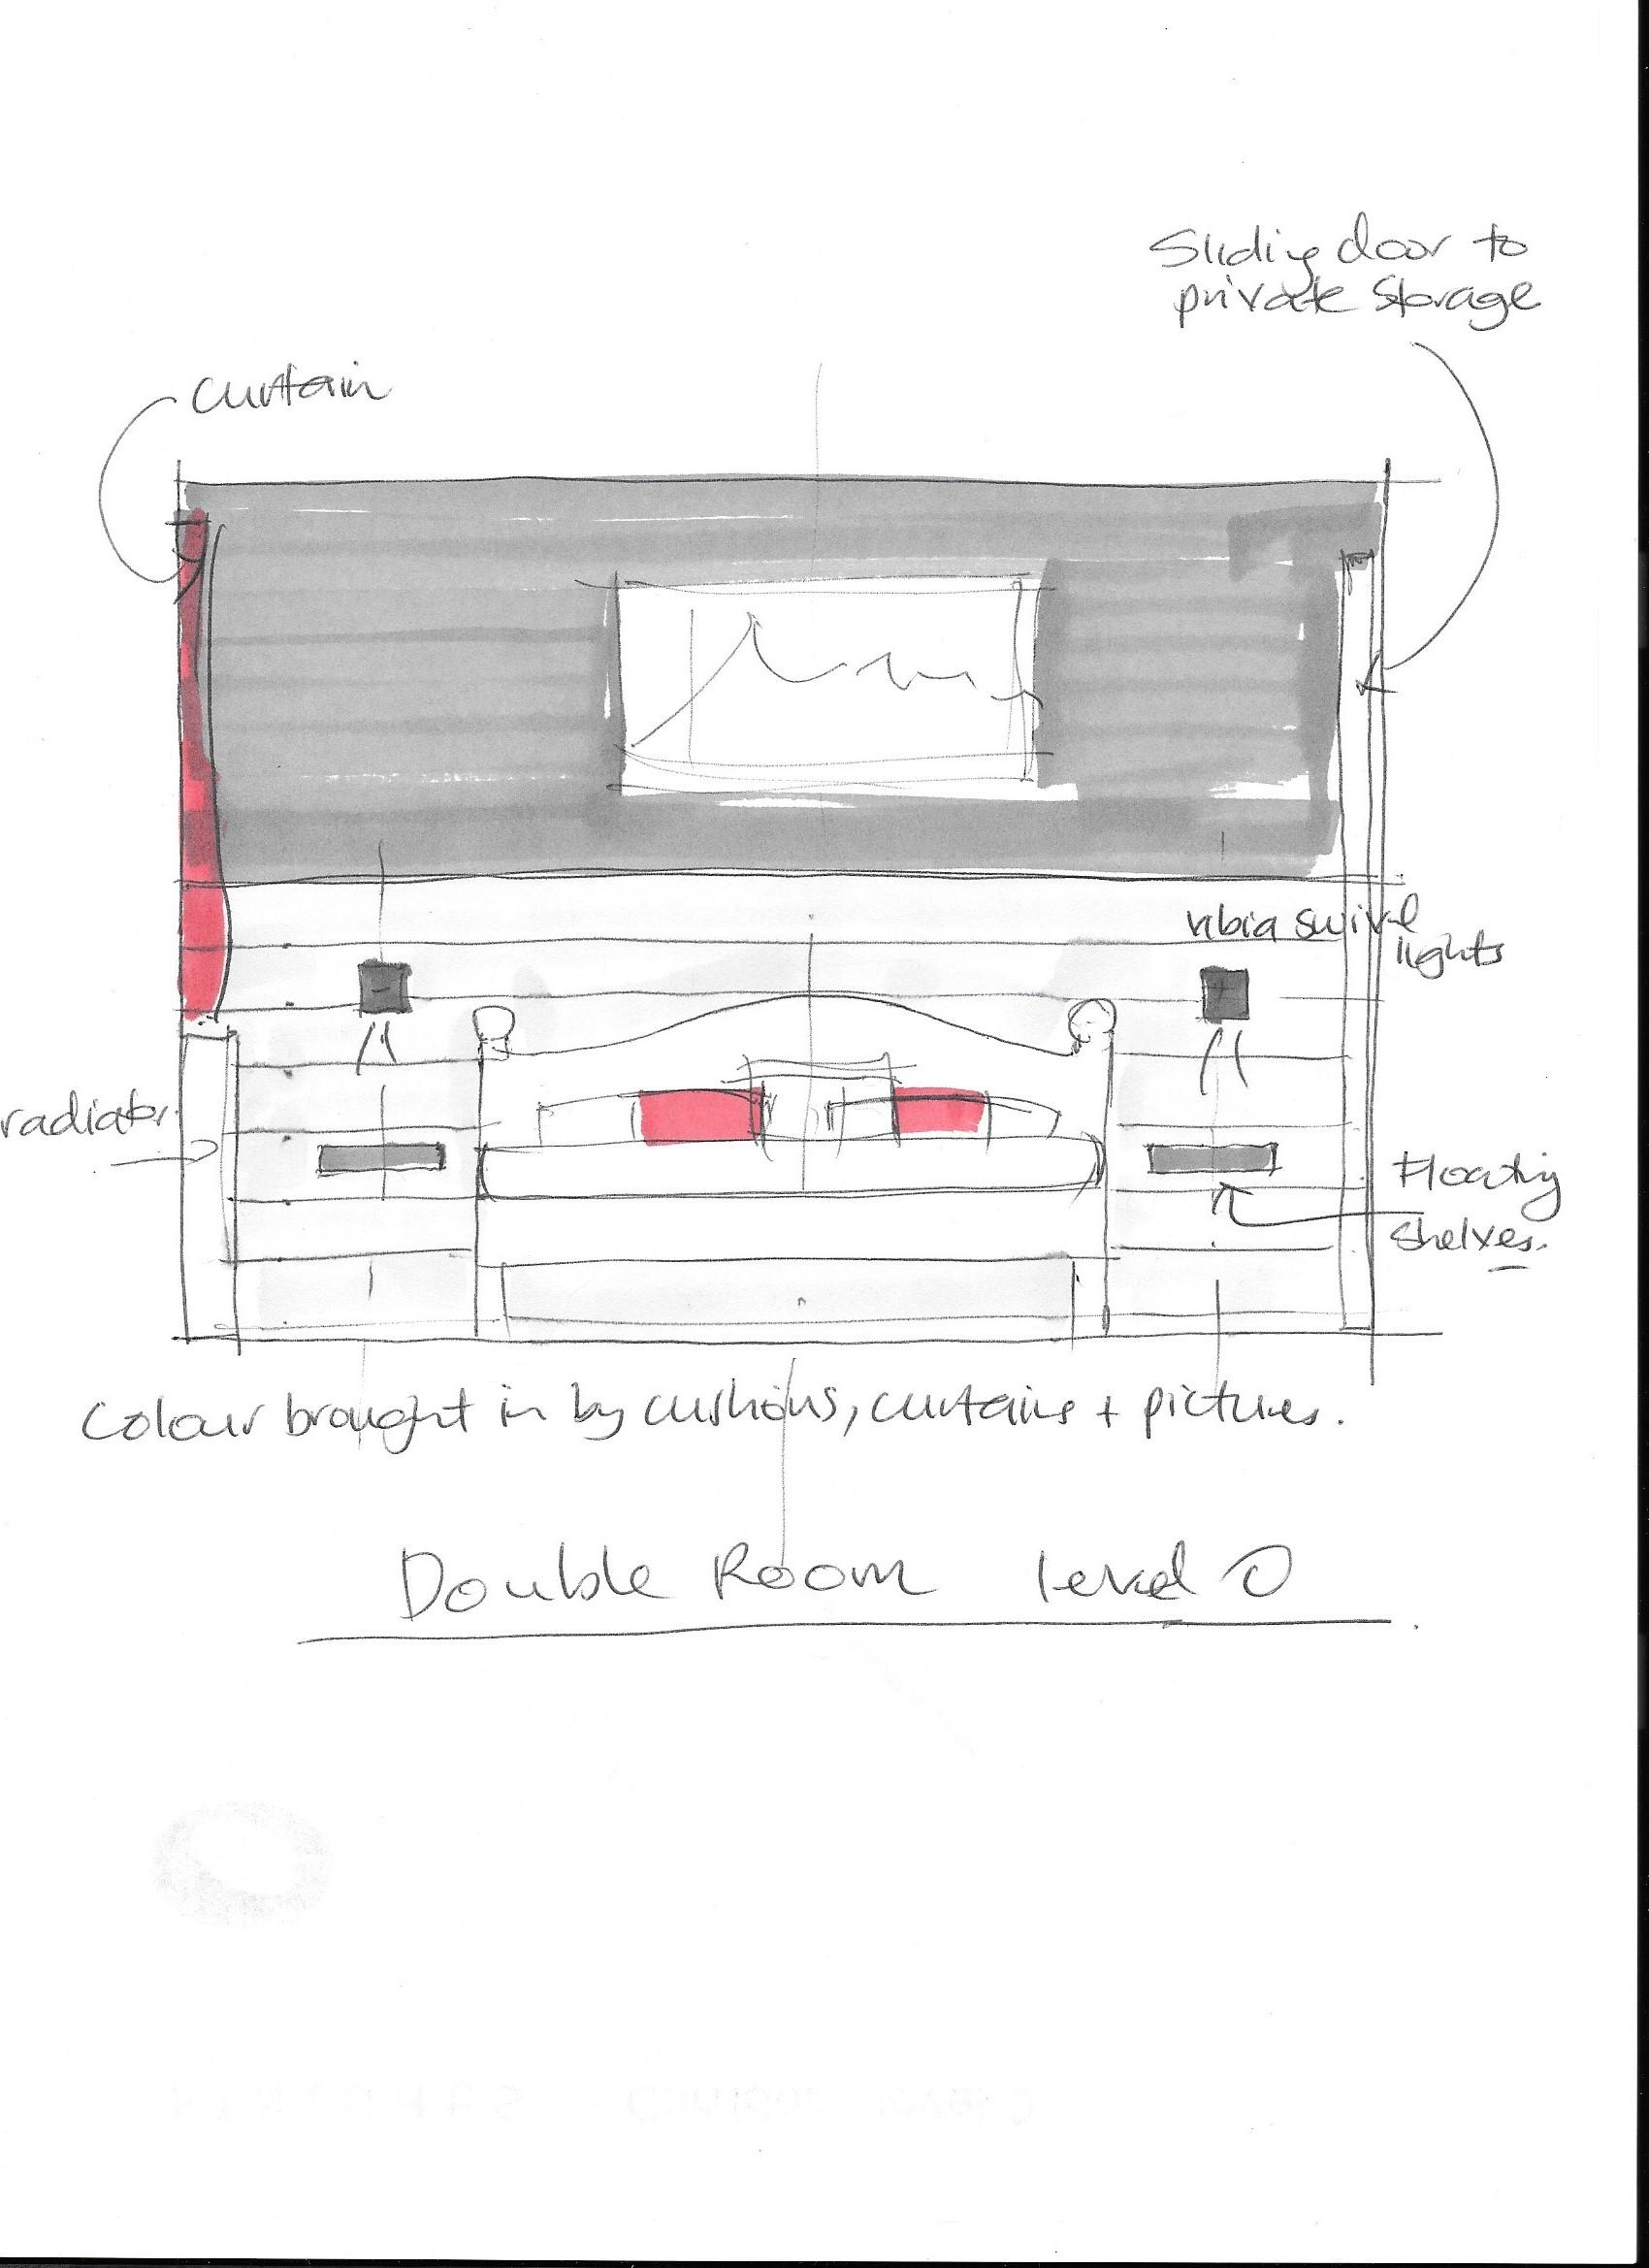 double bedroom level 0.jpg